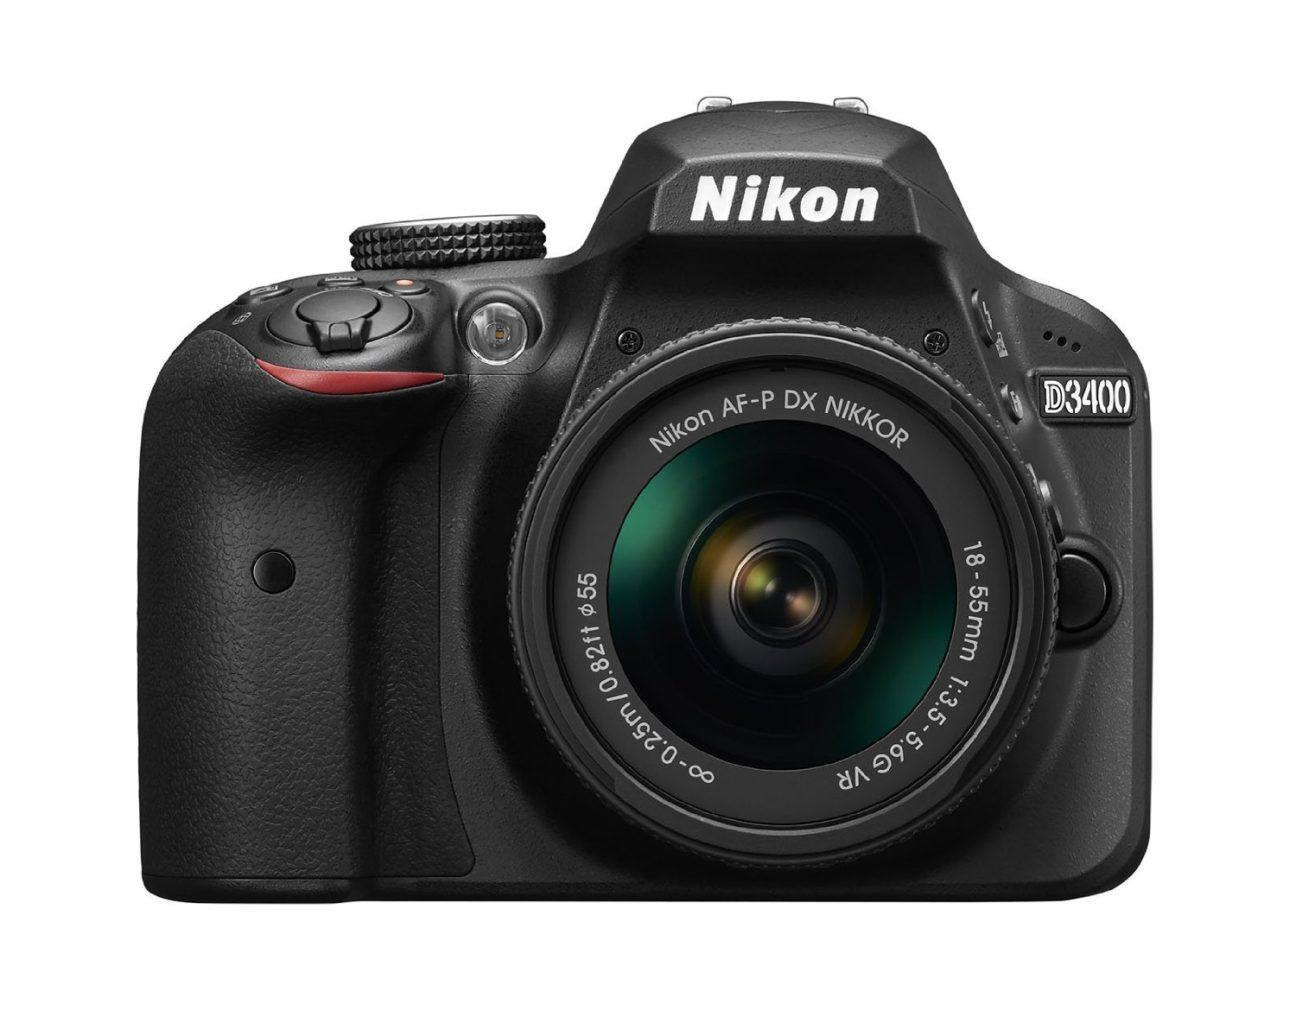 Nikon D3400 Black Friday & Cyber Monday Deals 2017